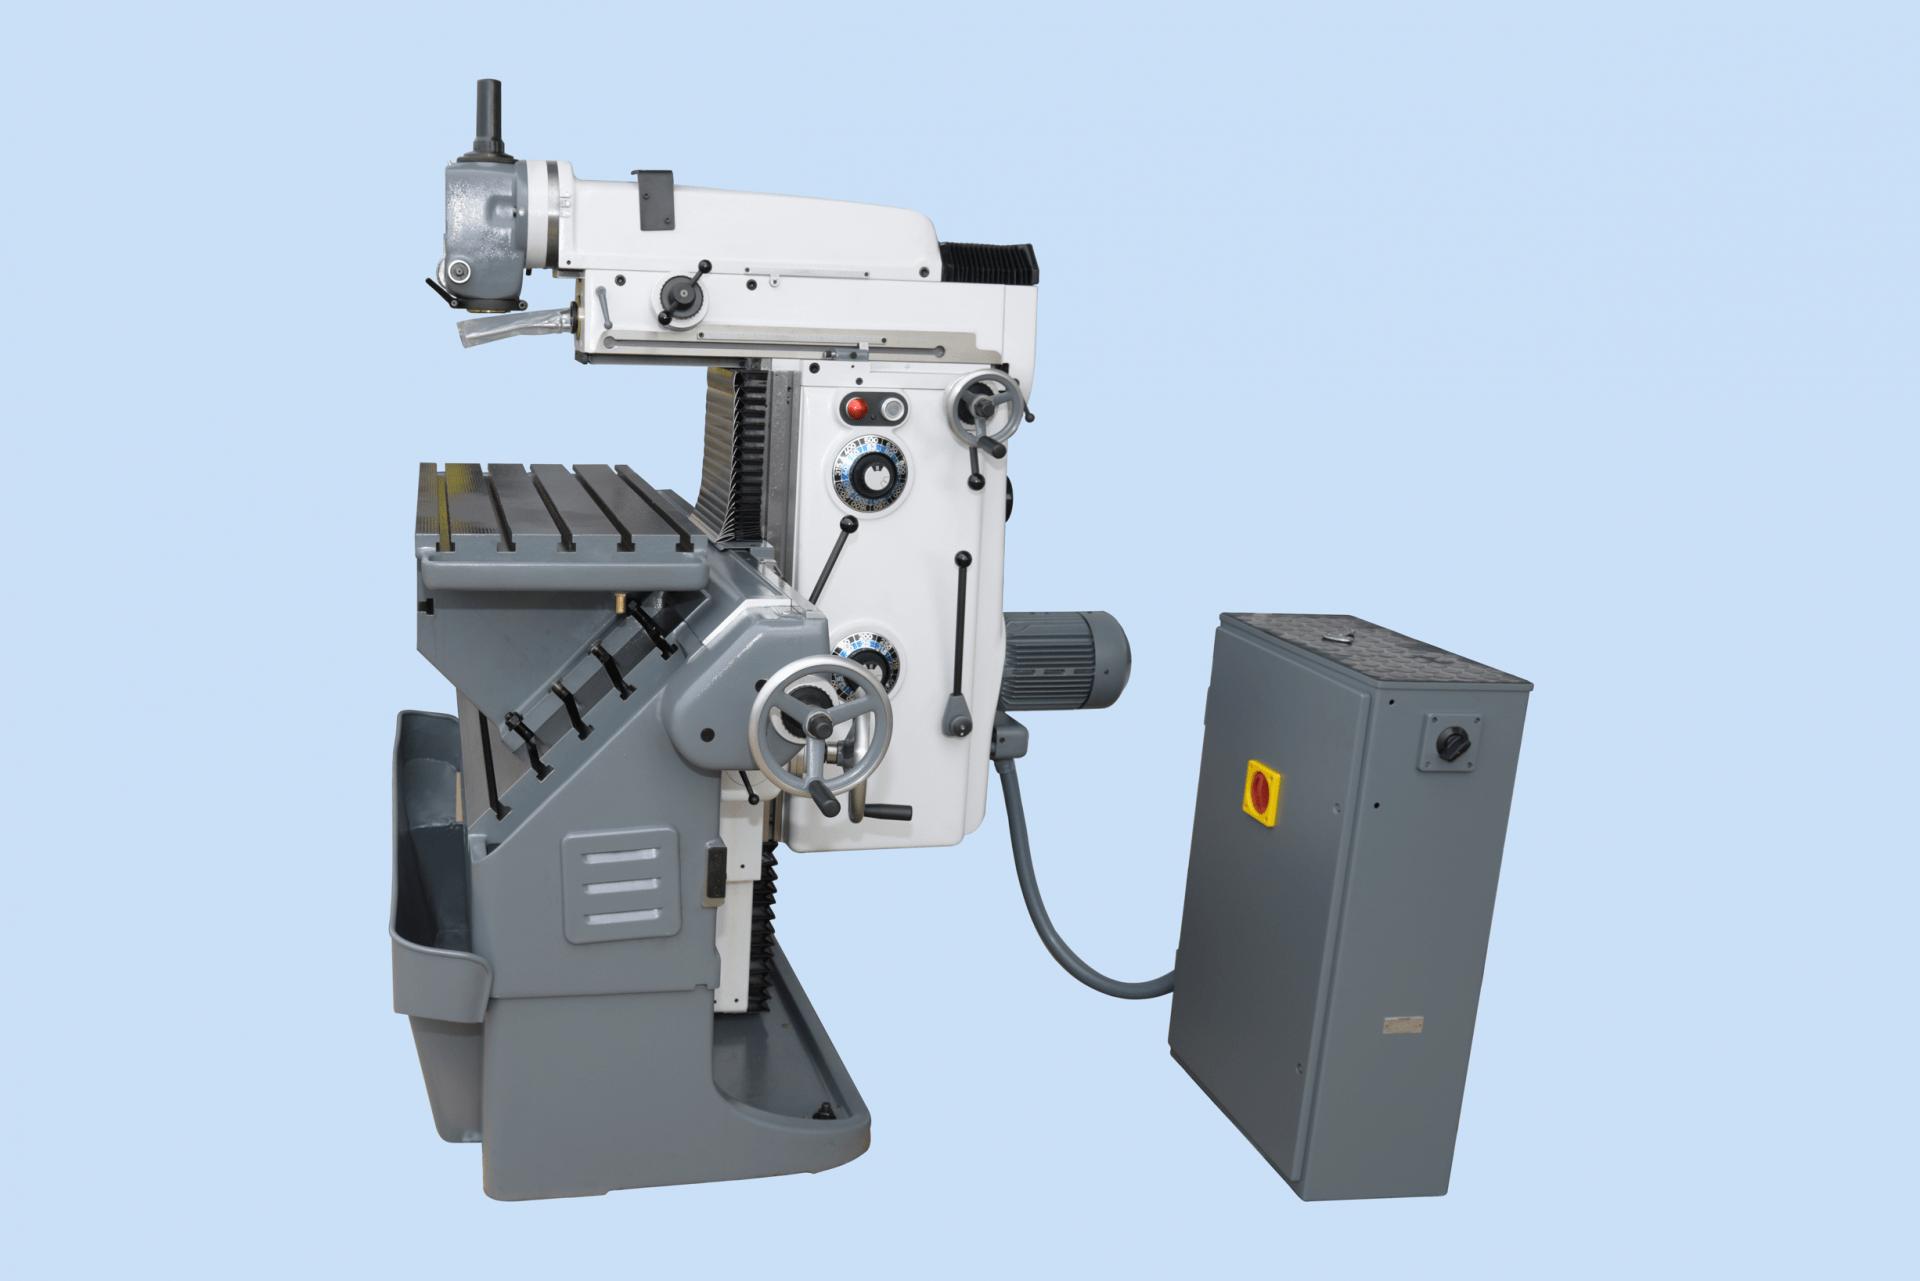 Fräsmaschine: Deckel FP3 L (Überholt)